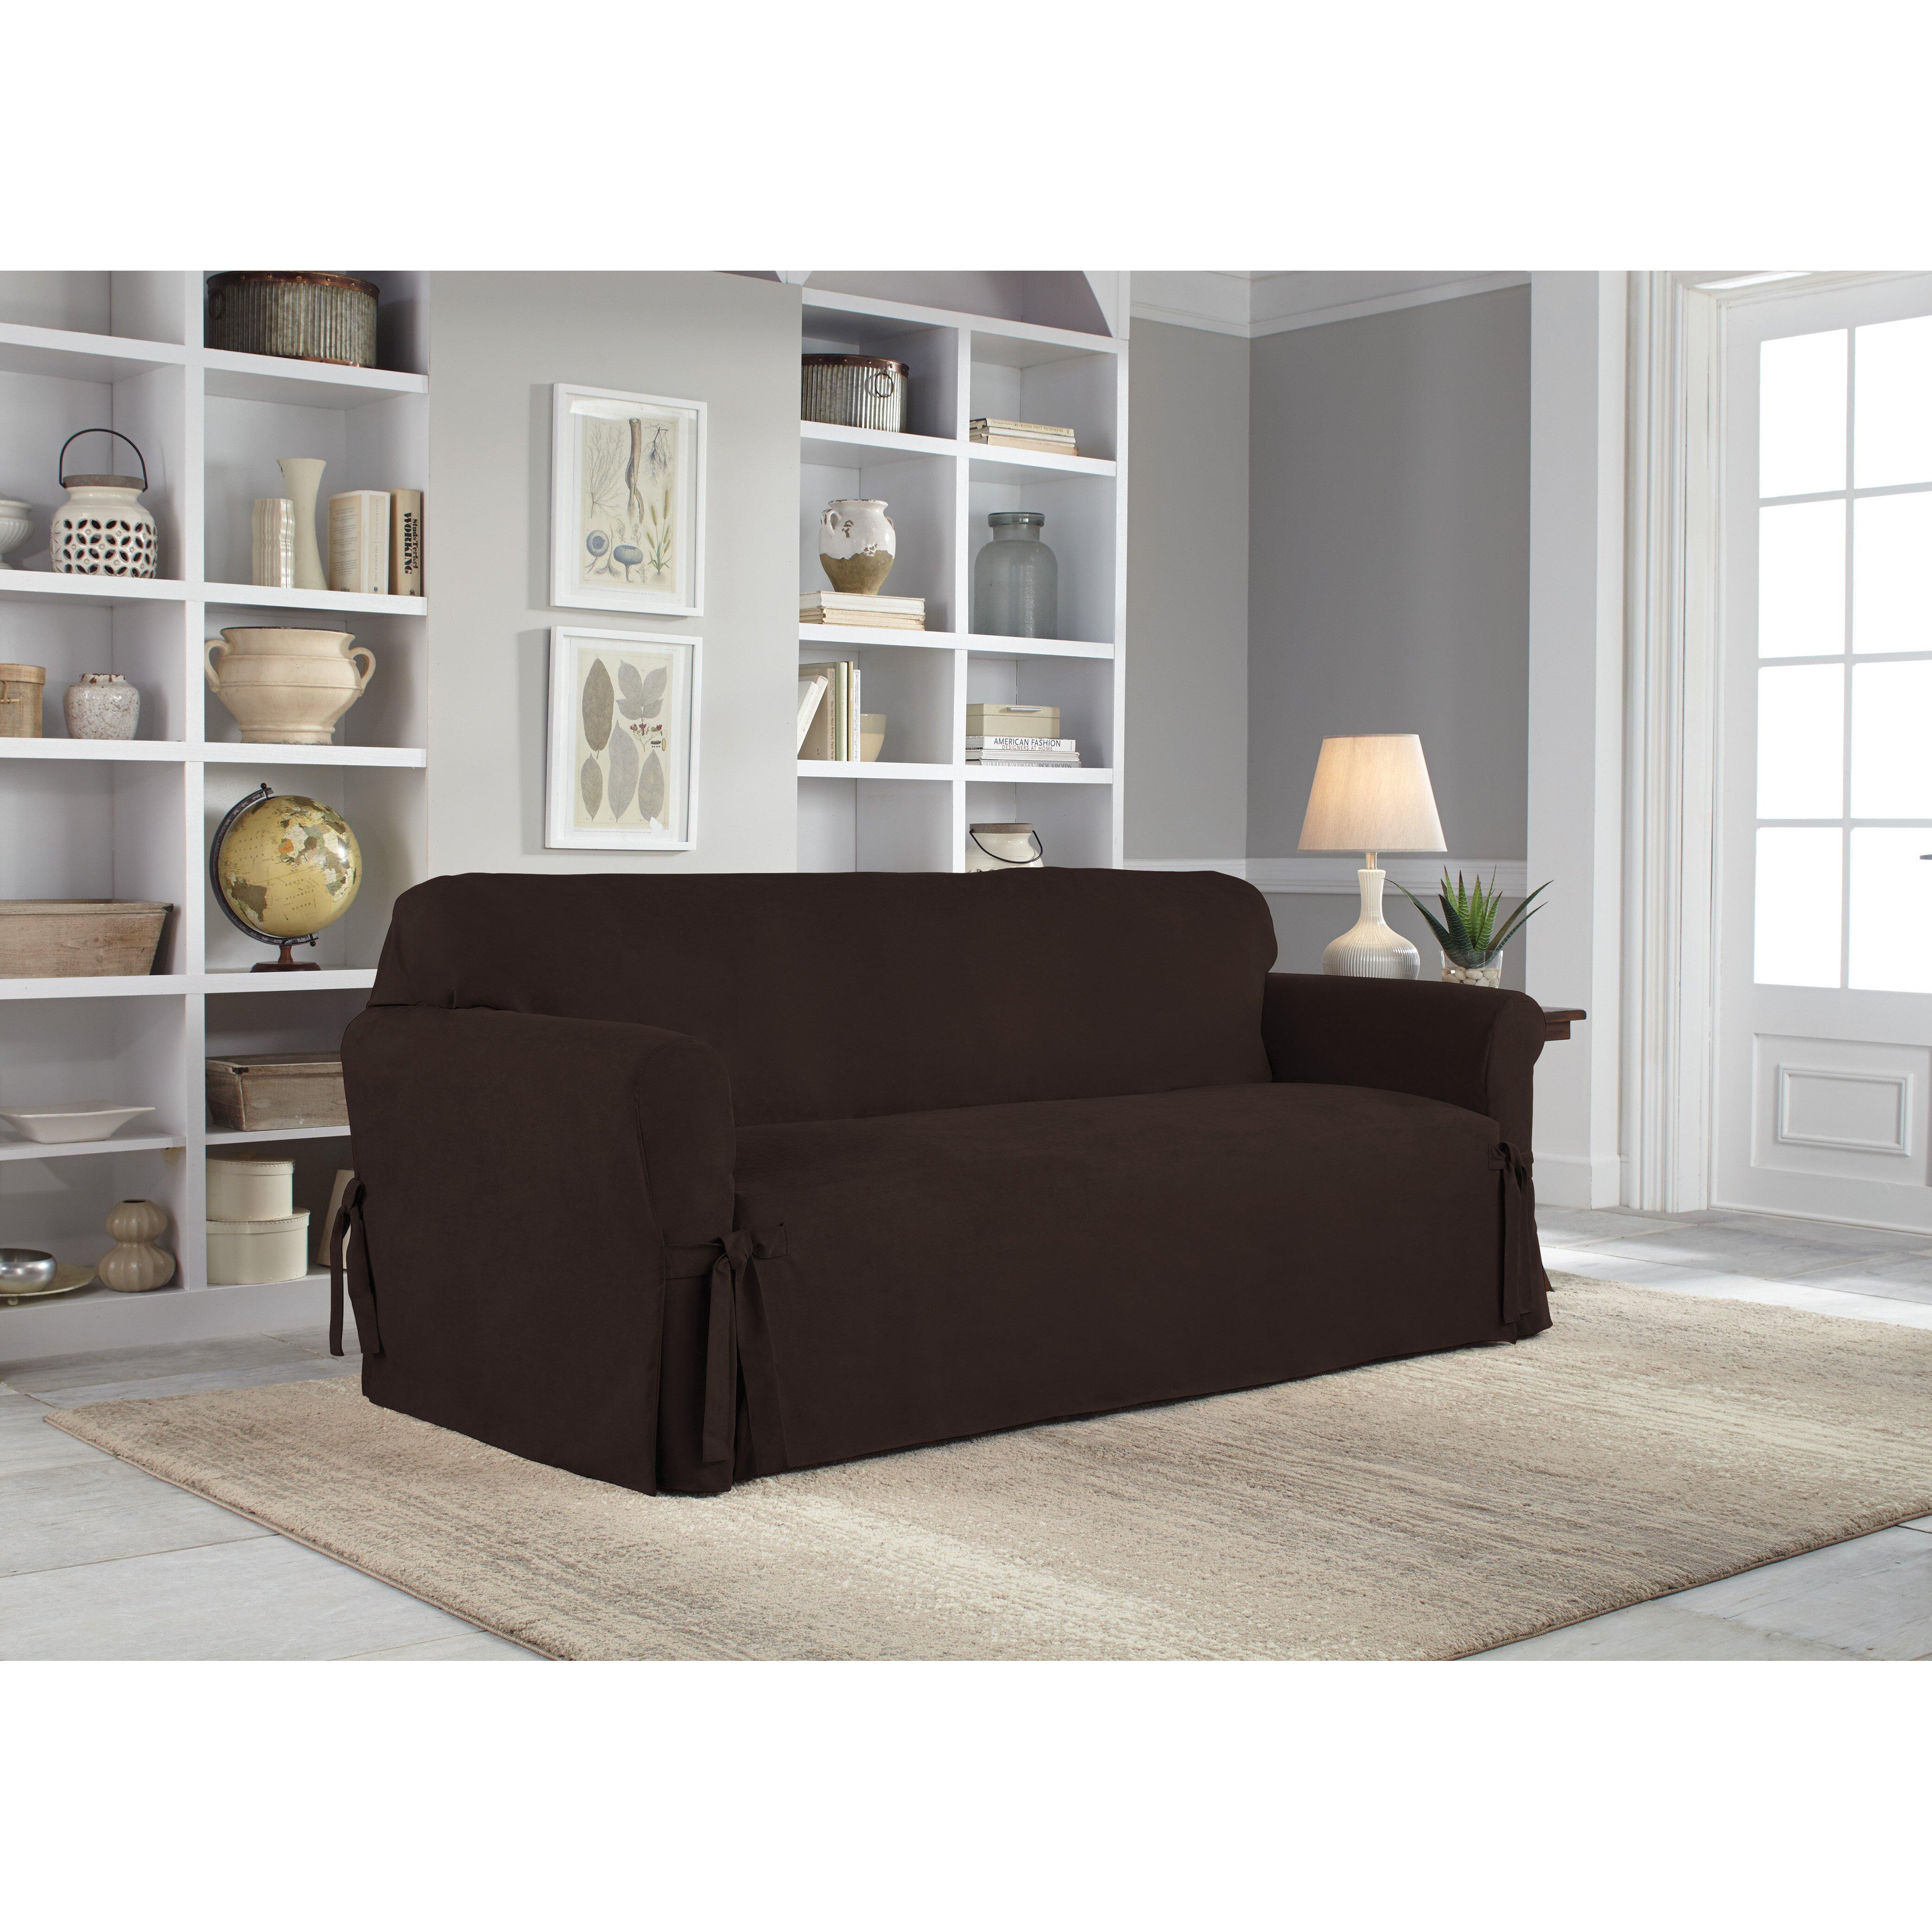 furniture living room furniture sofa slipcovers serta sku xs3456